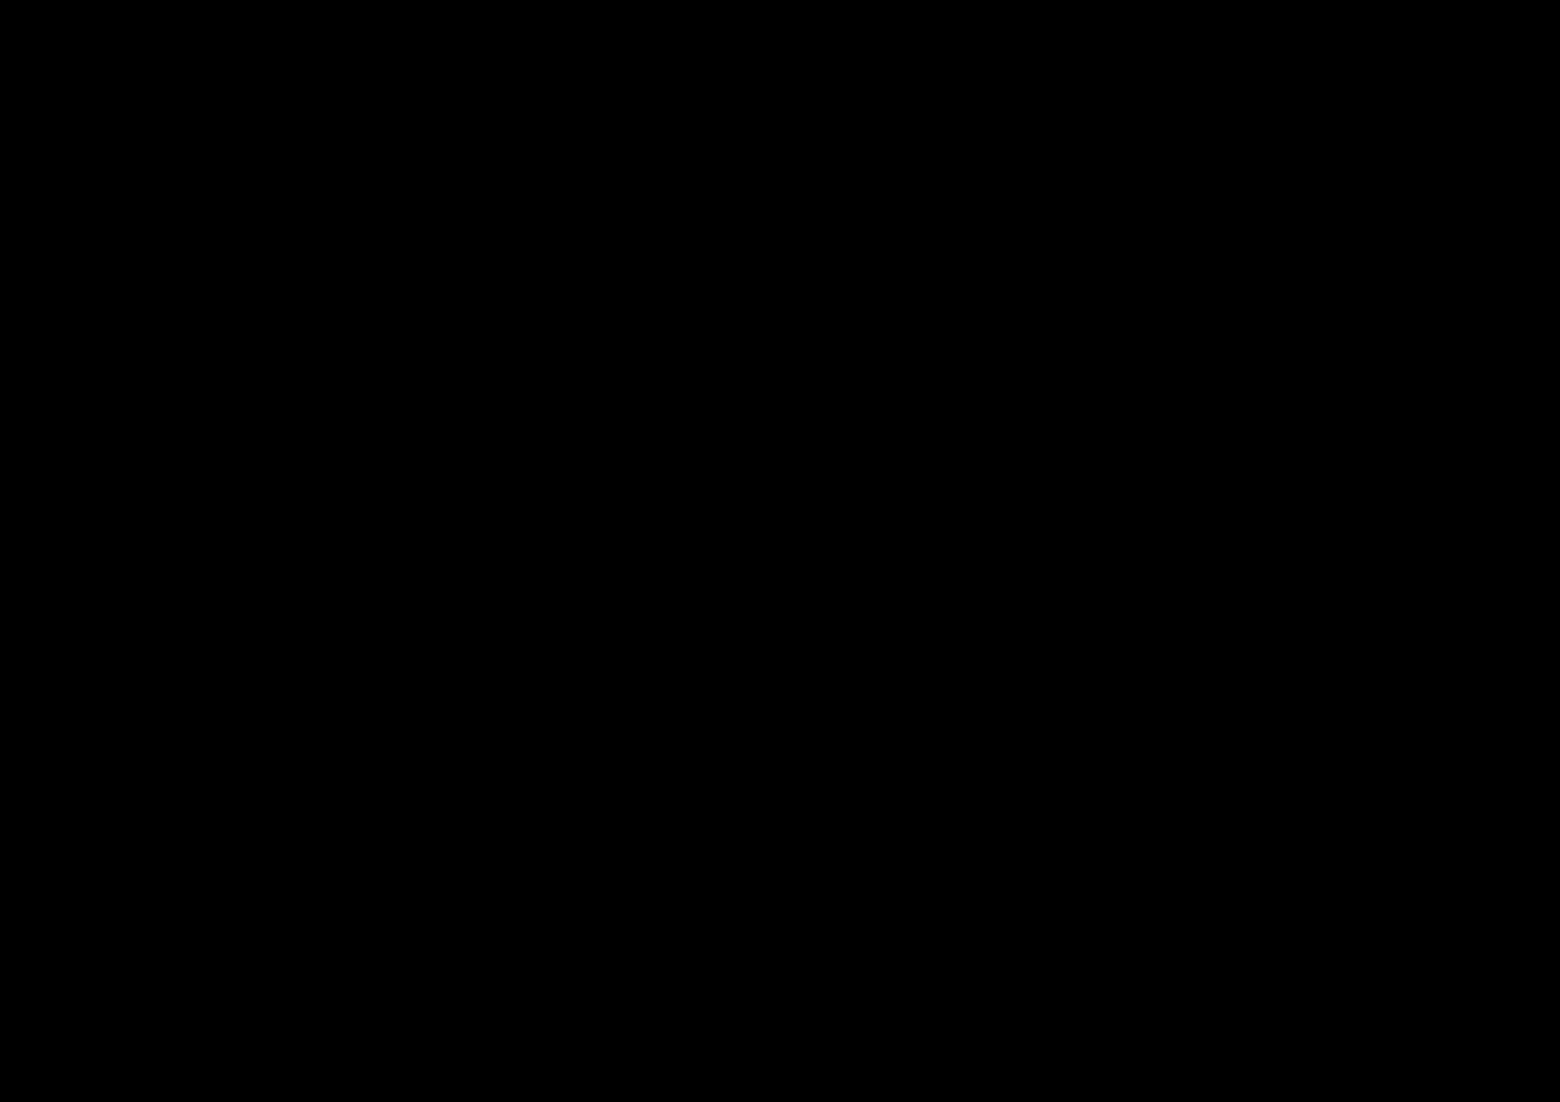 img_0450-7777